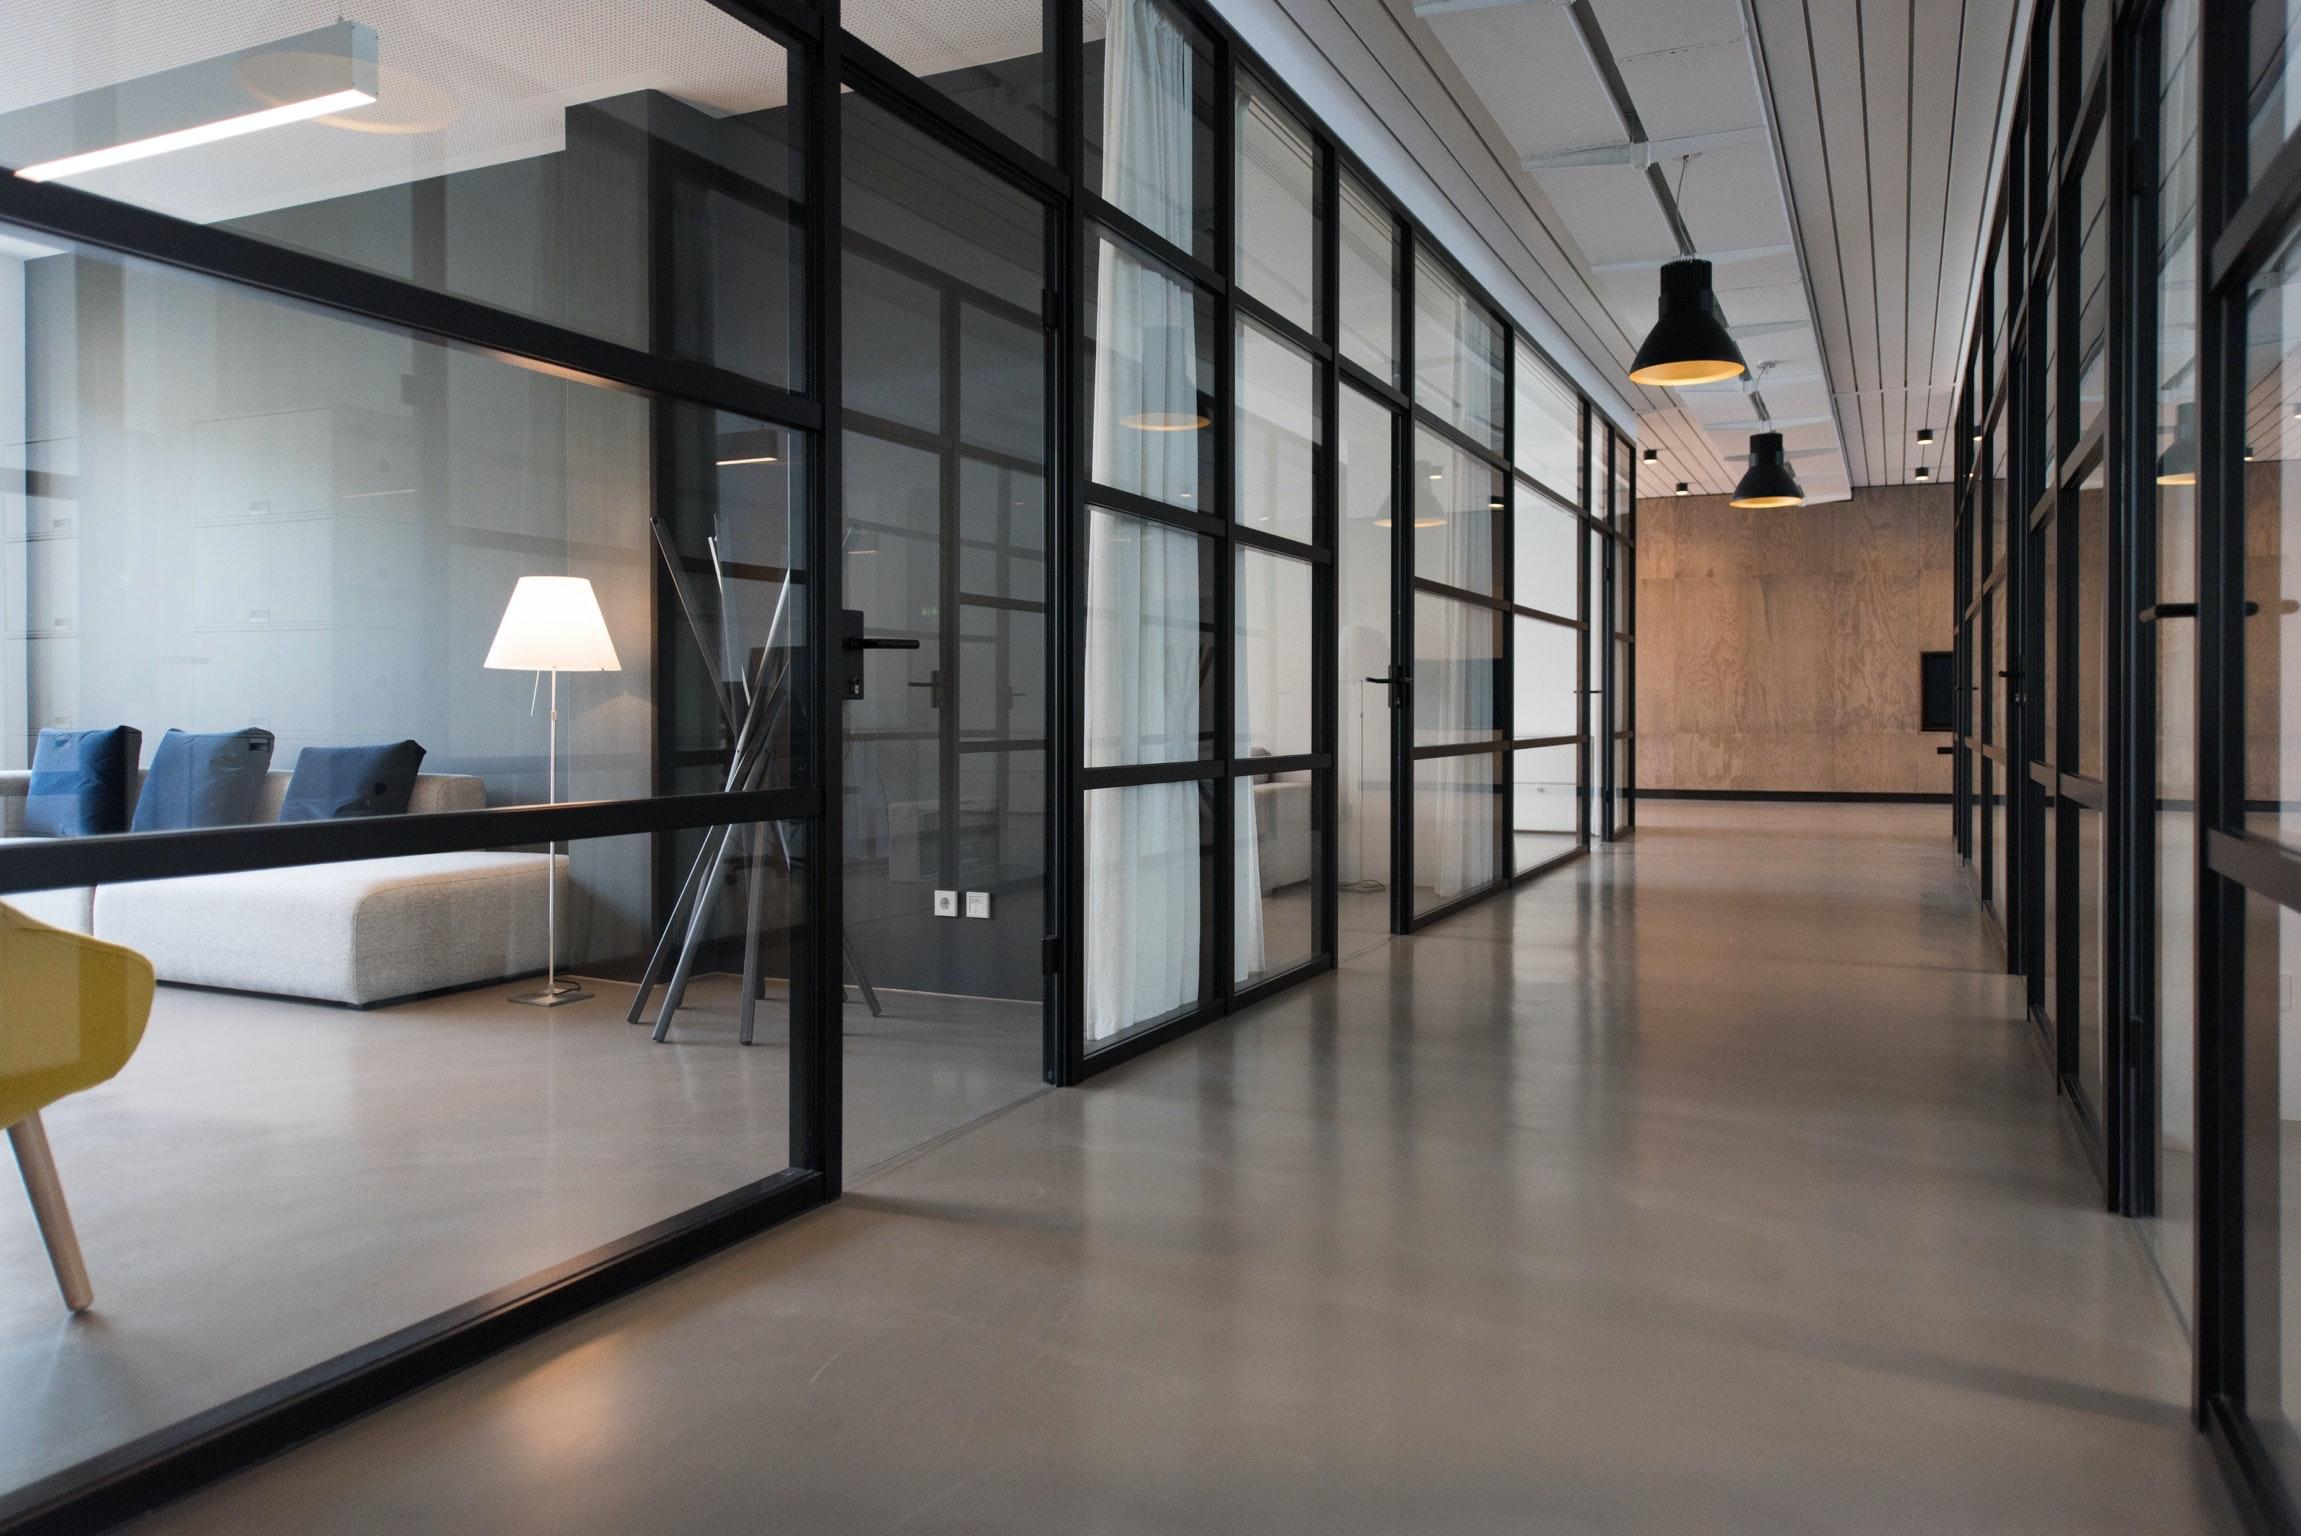 List of 3 office property investors in Spain